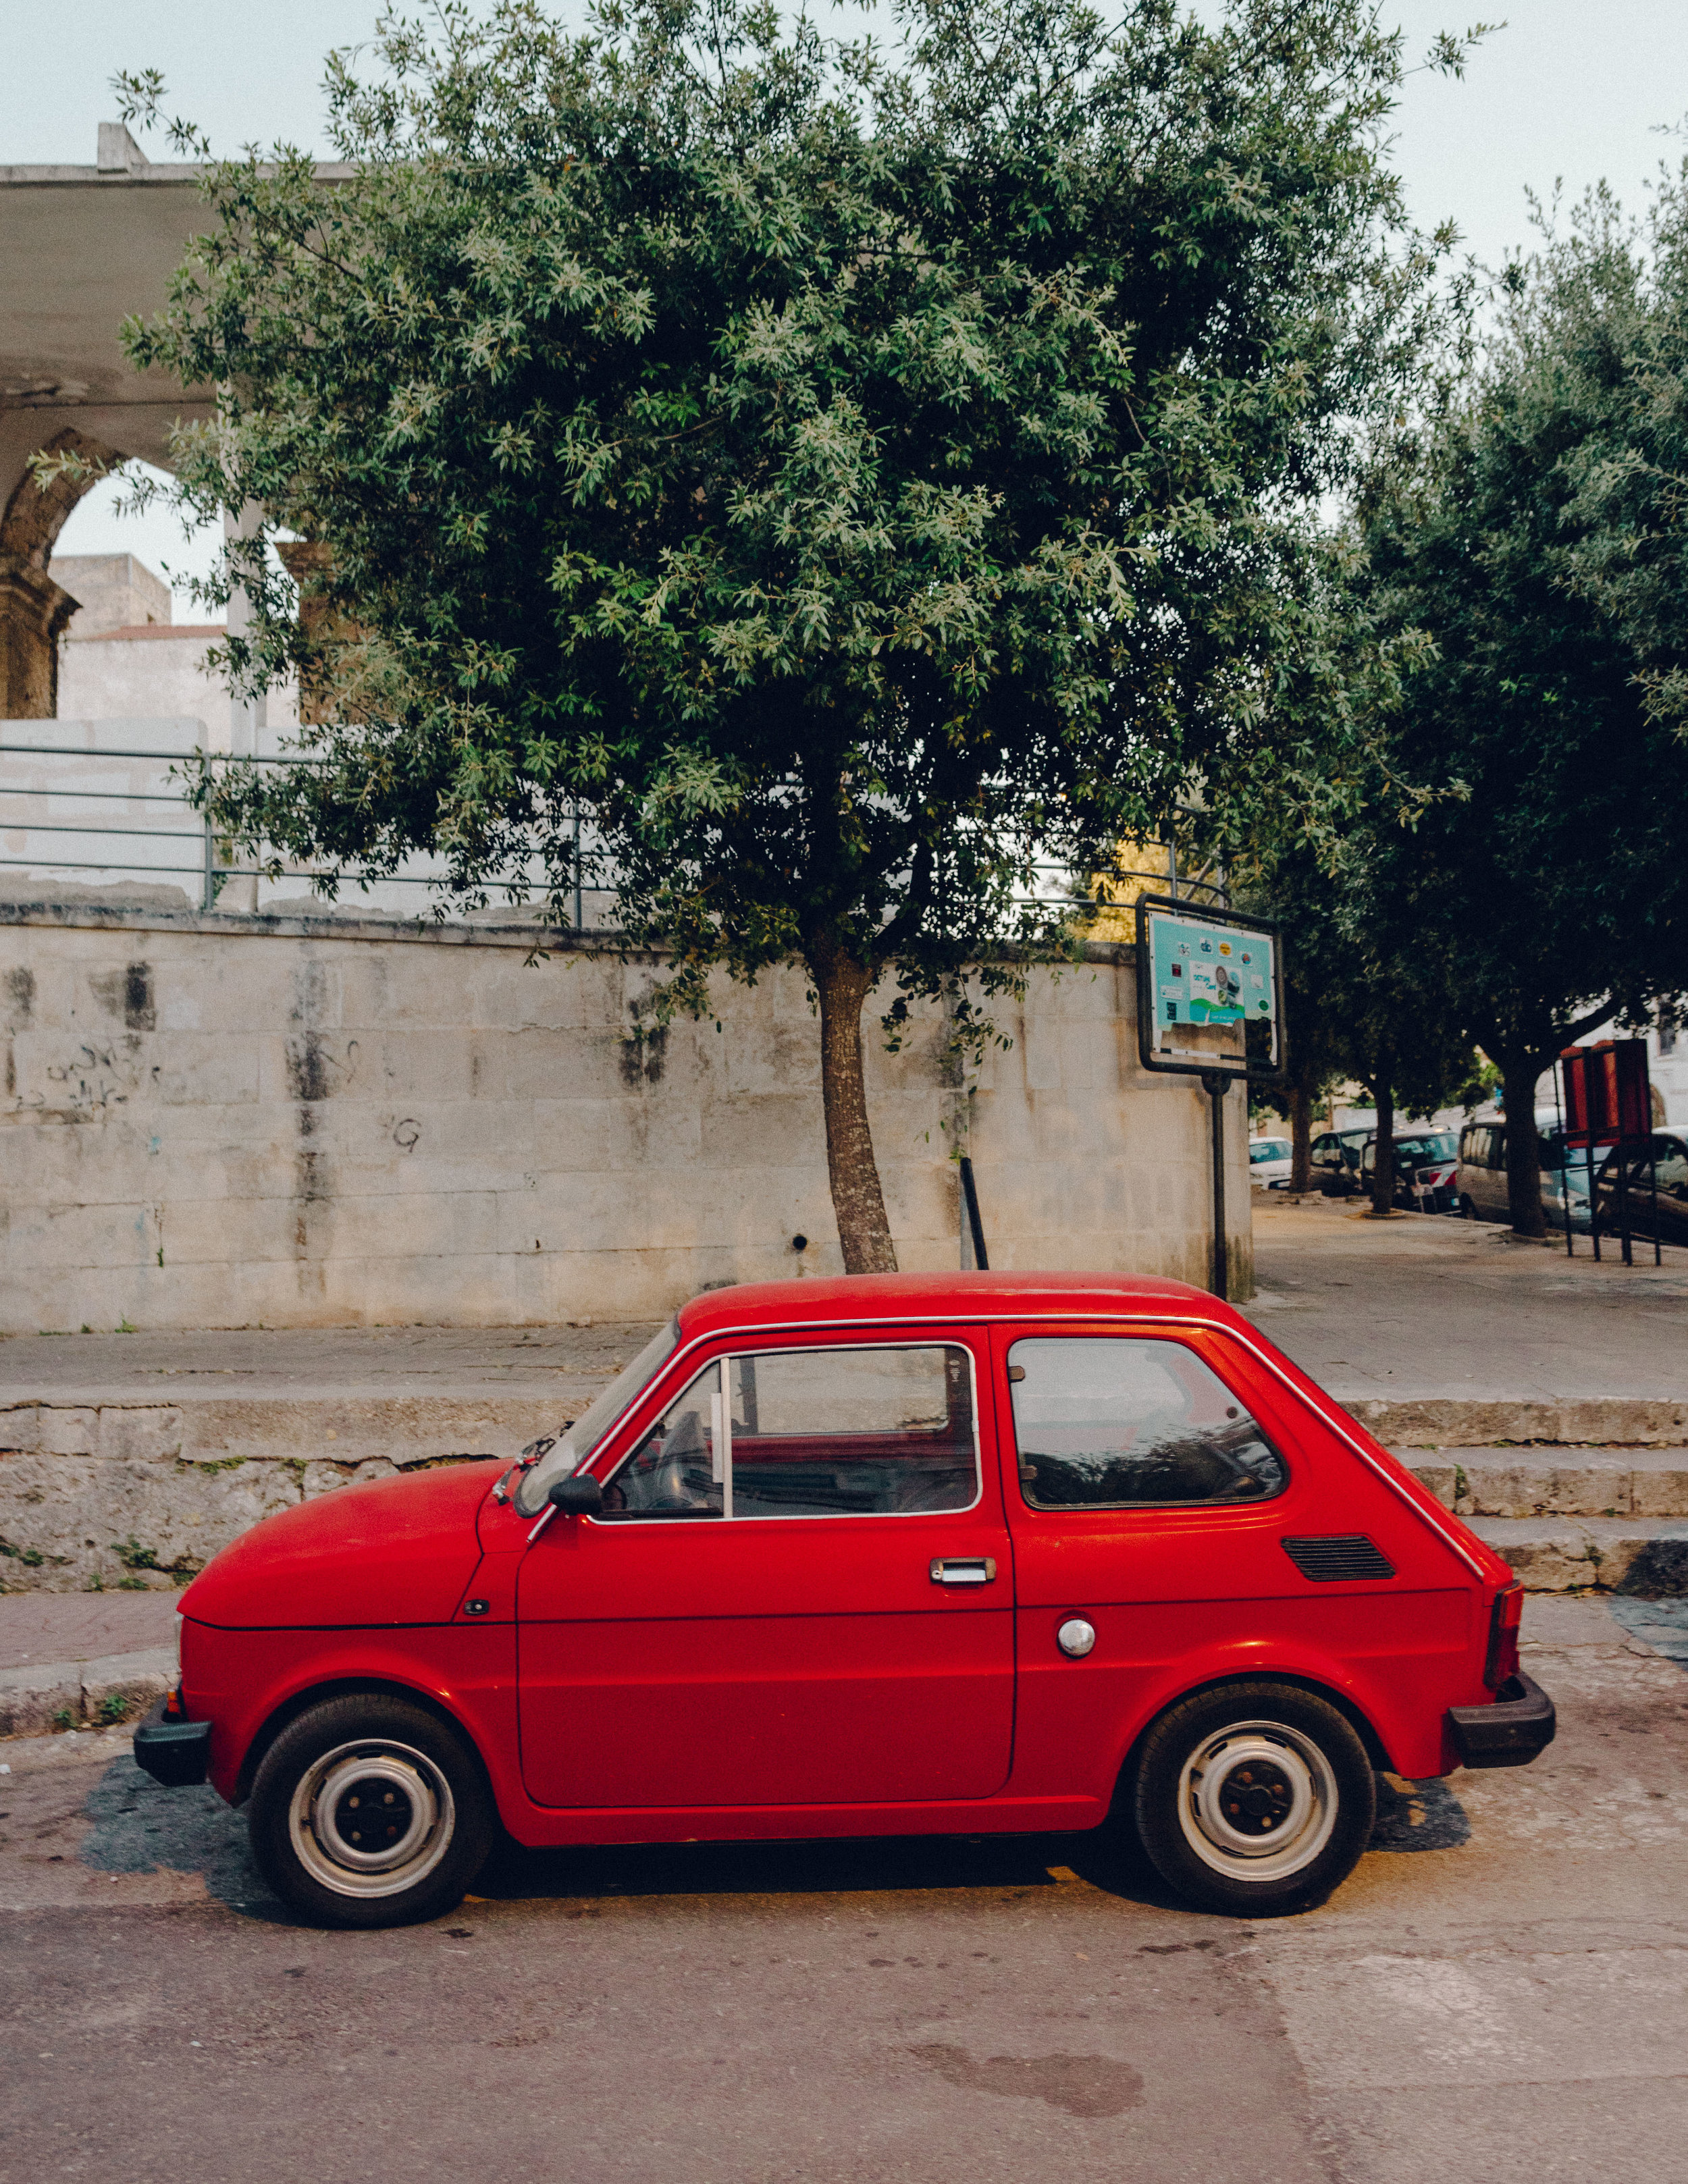 ASROSENVINGE_Roadtrip_Italy_Puglia_Ostuni-07380.jpg